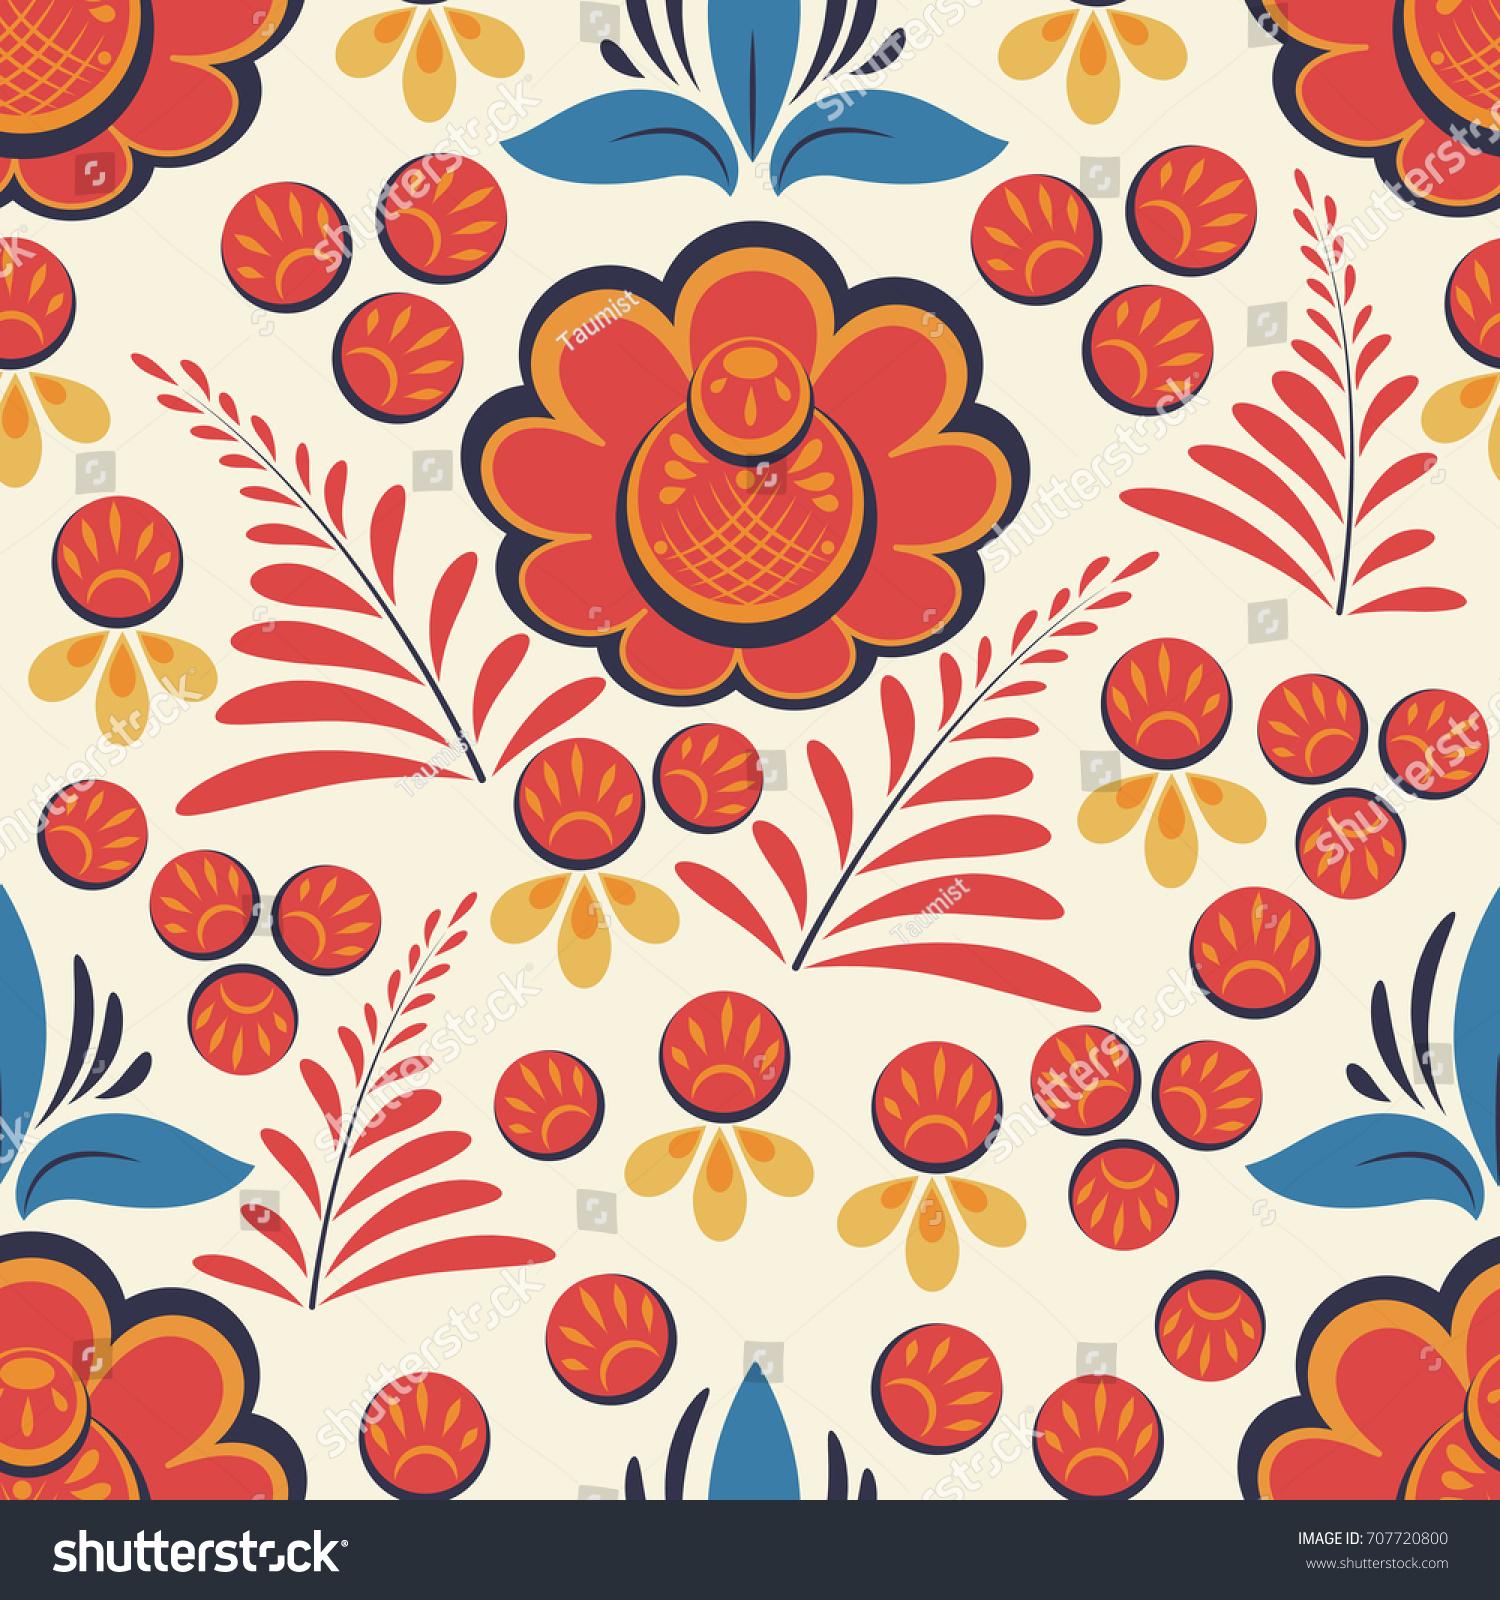 Patterns for drawing in Russian folk art